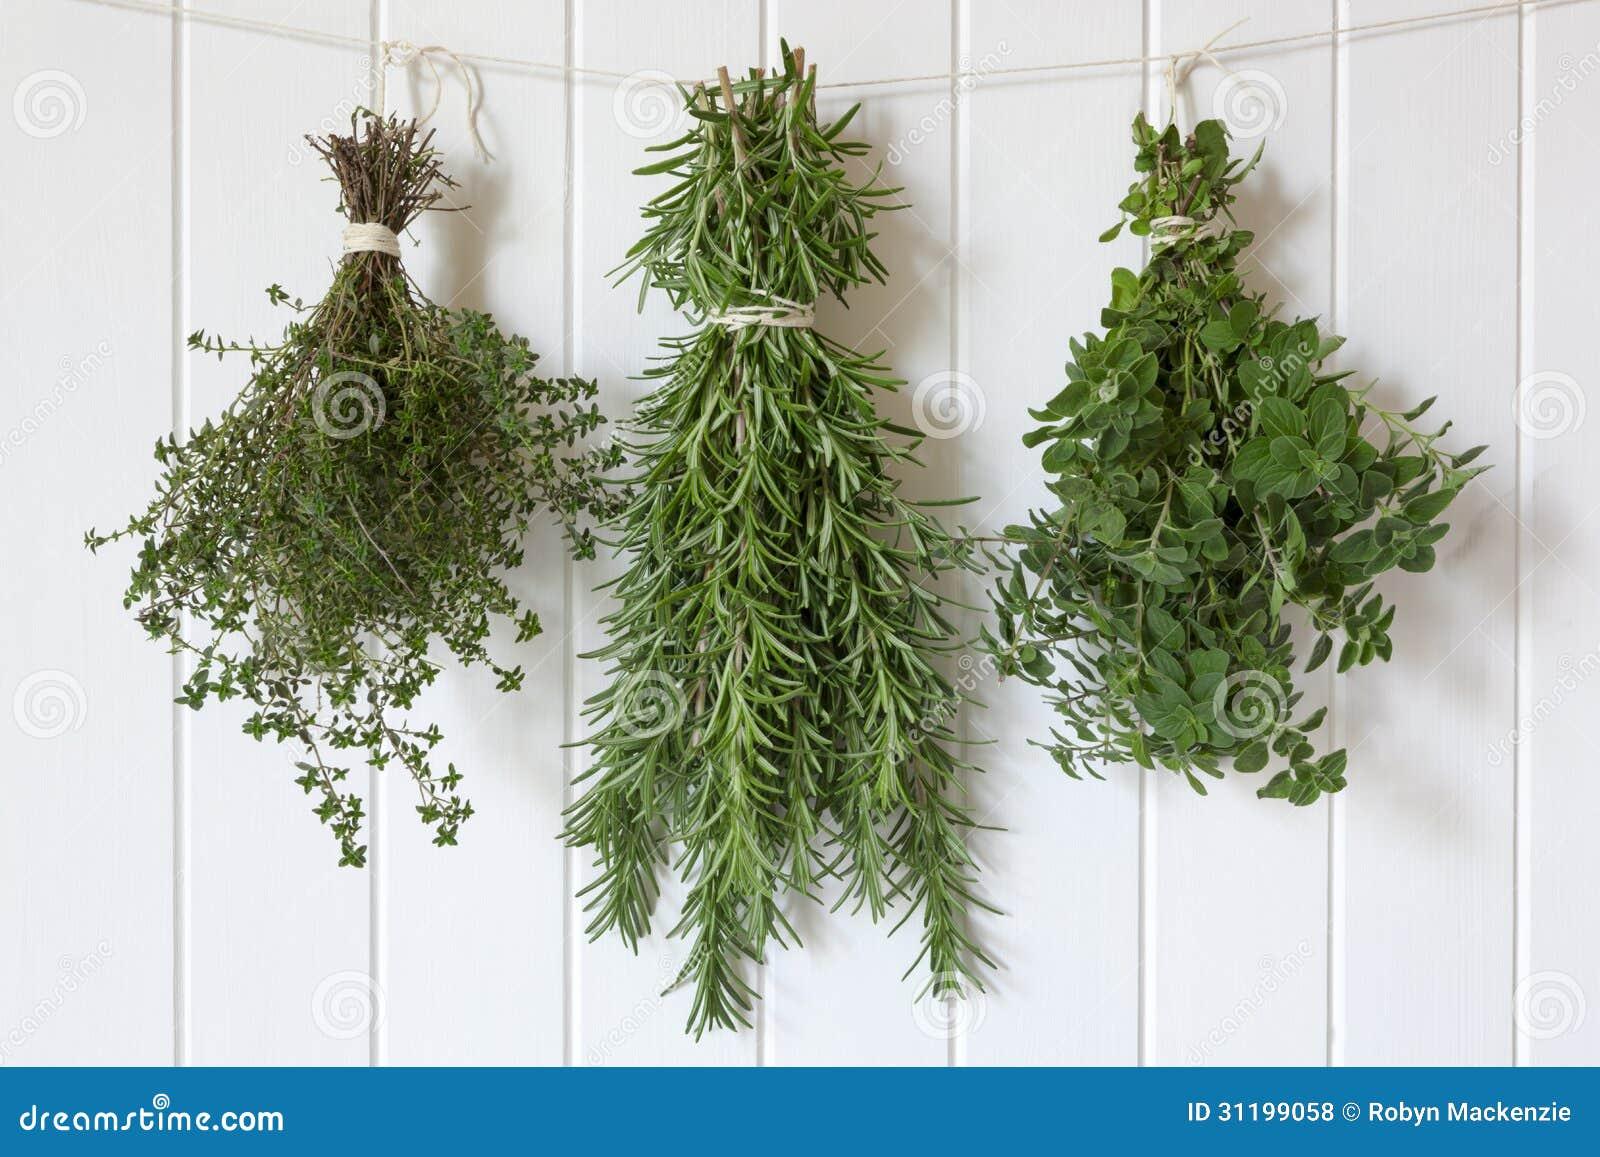 Different herbs royalty free stock image image 16265346 - Neues Kraut H Ngen Lizenzfreie Stockfotos